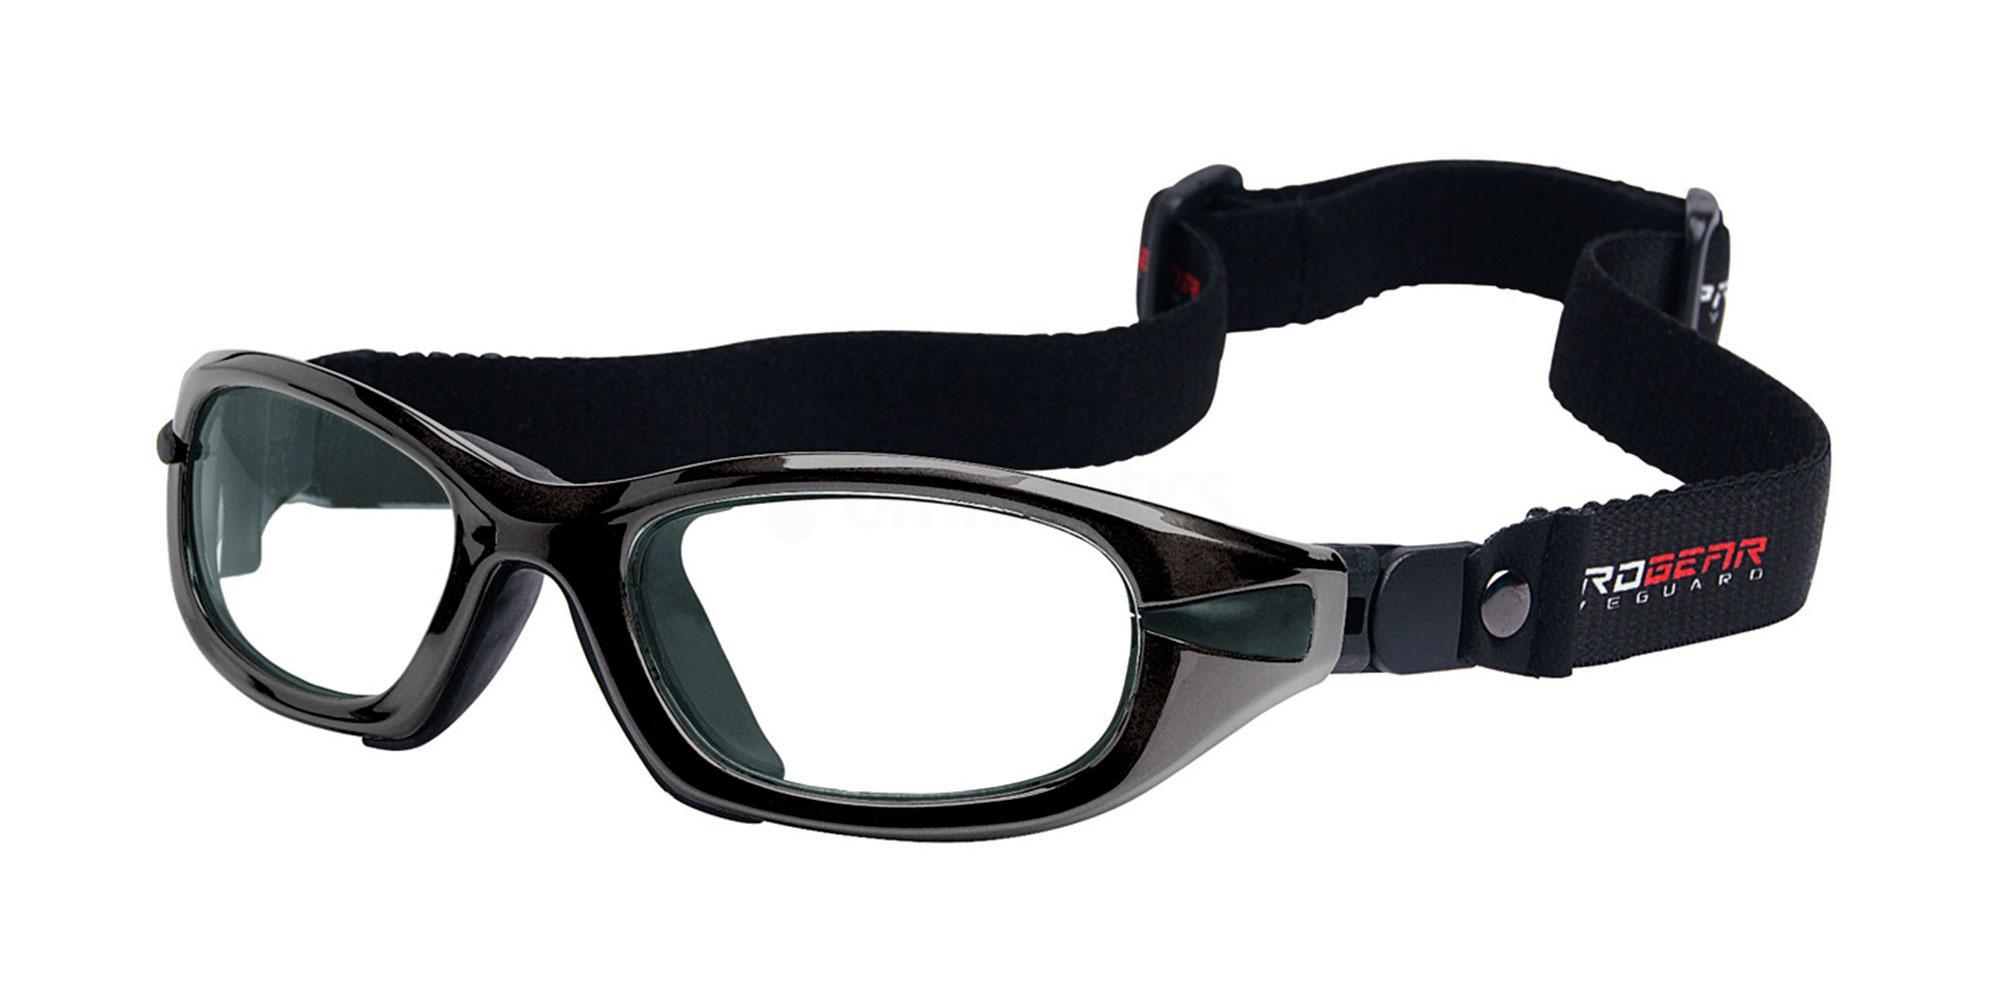 Black Progear EG-L 1031 Accessories, Sports Eyewear